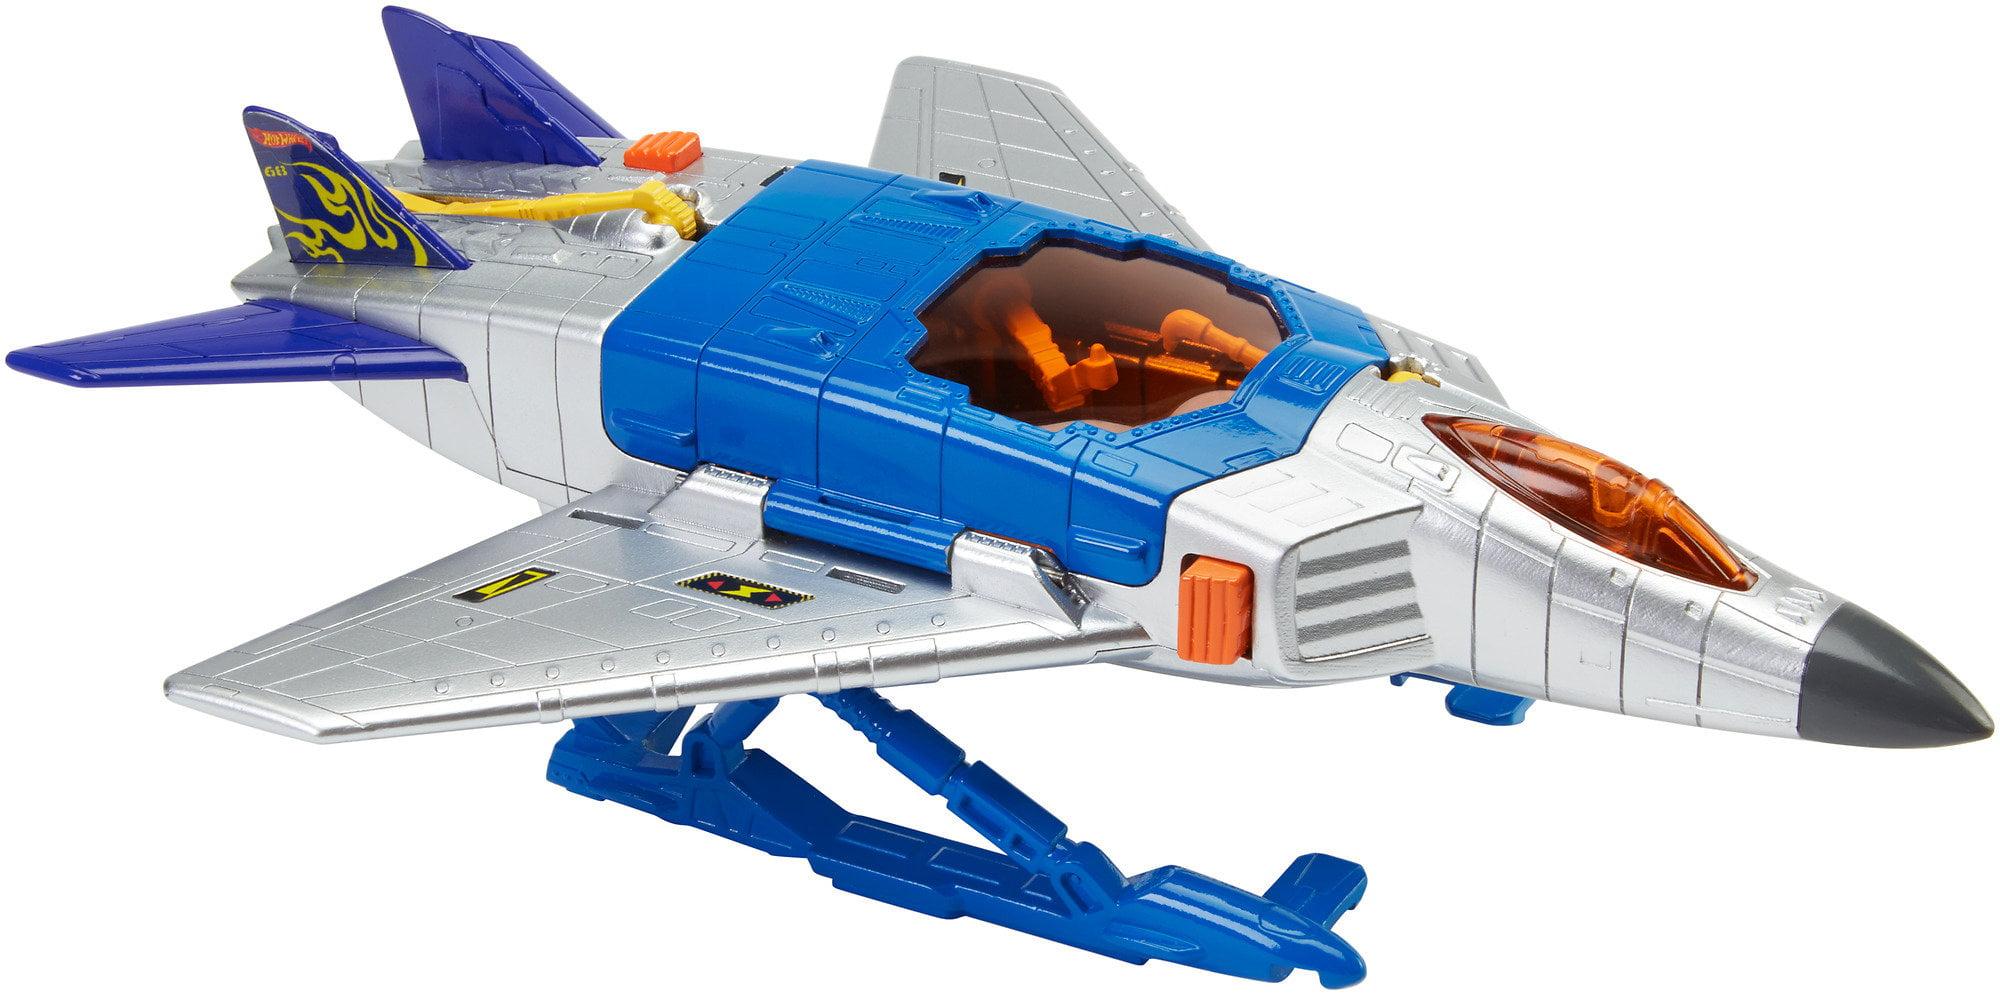 Hot Wheels Jet Fueler Vehicle by Mattel